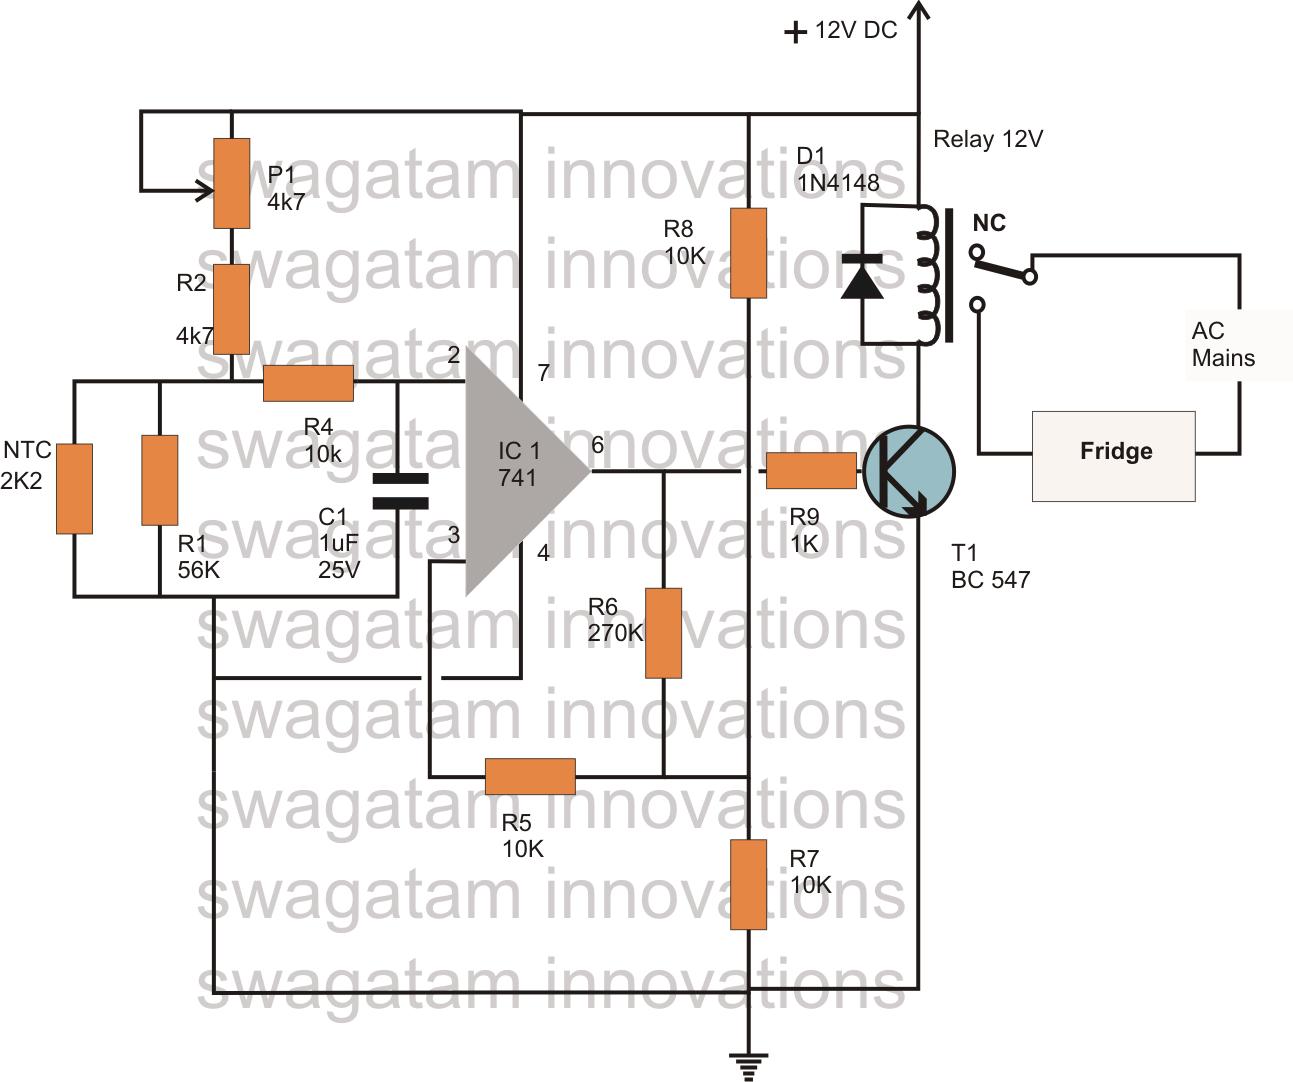 medium resolution of diy incubator wiring makers frigidaire refrigerator defrost thermostat diagram ge refrigerator thermostat replacement